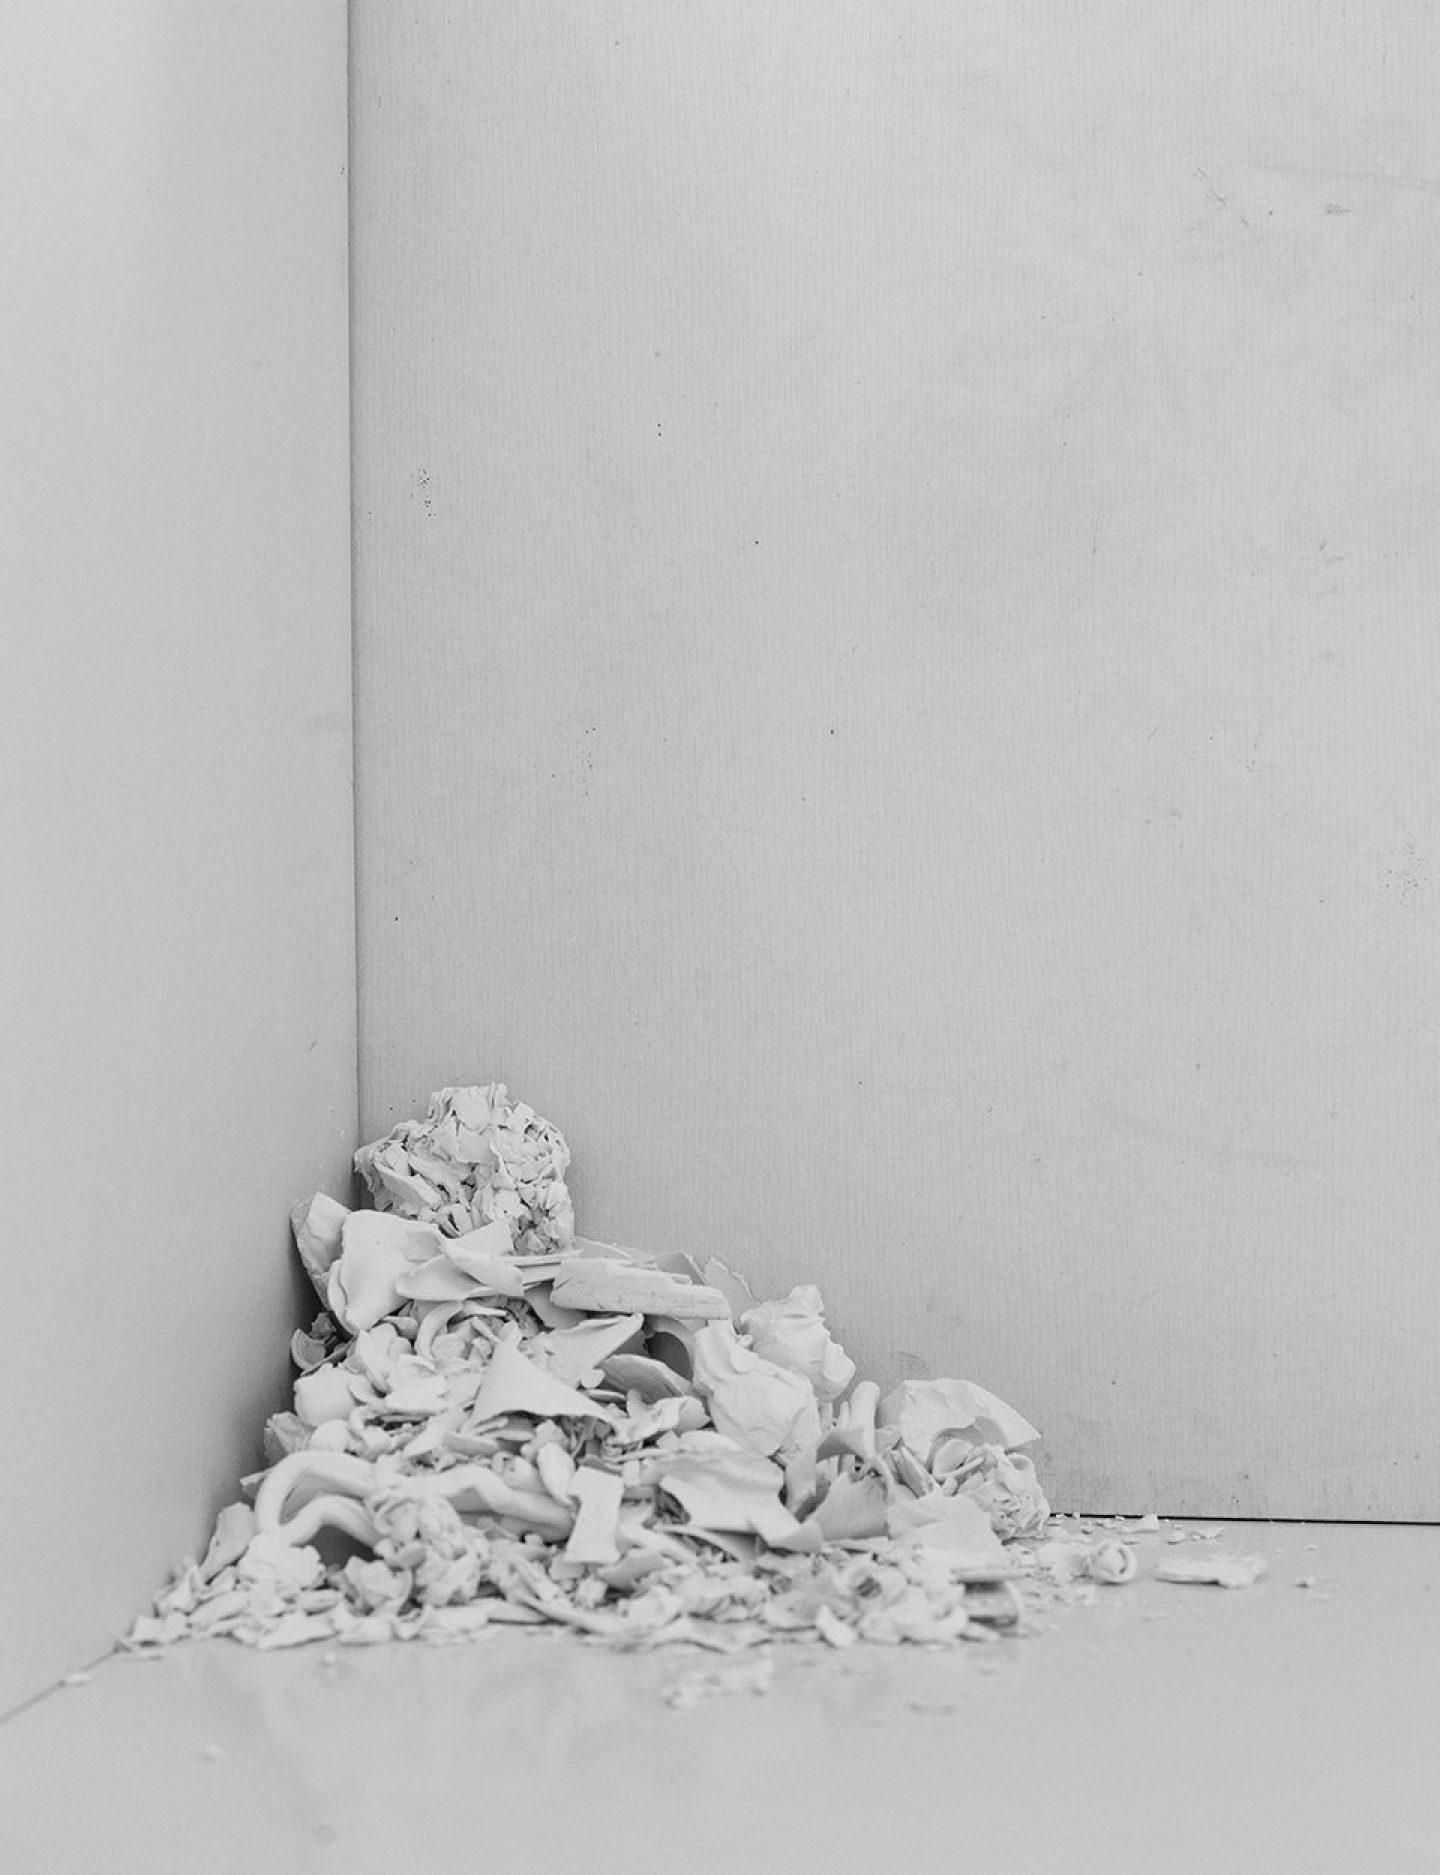 IGNANT-Photography-Gruenberger-ALetterToAFriend-10